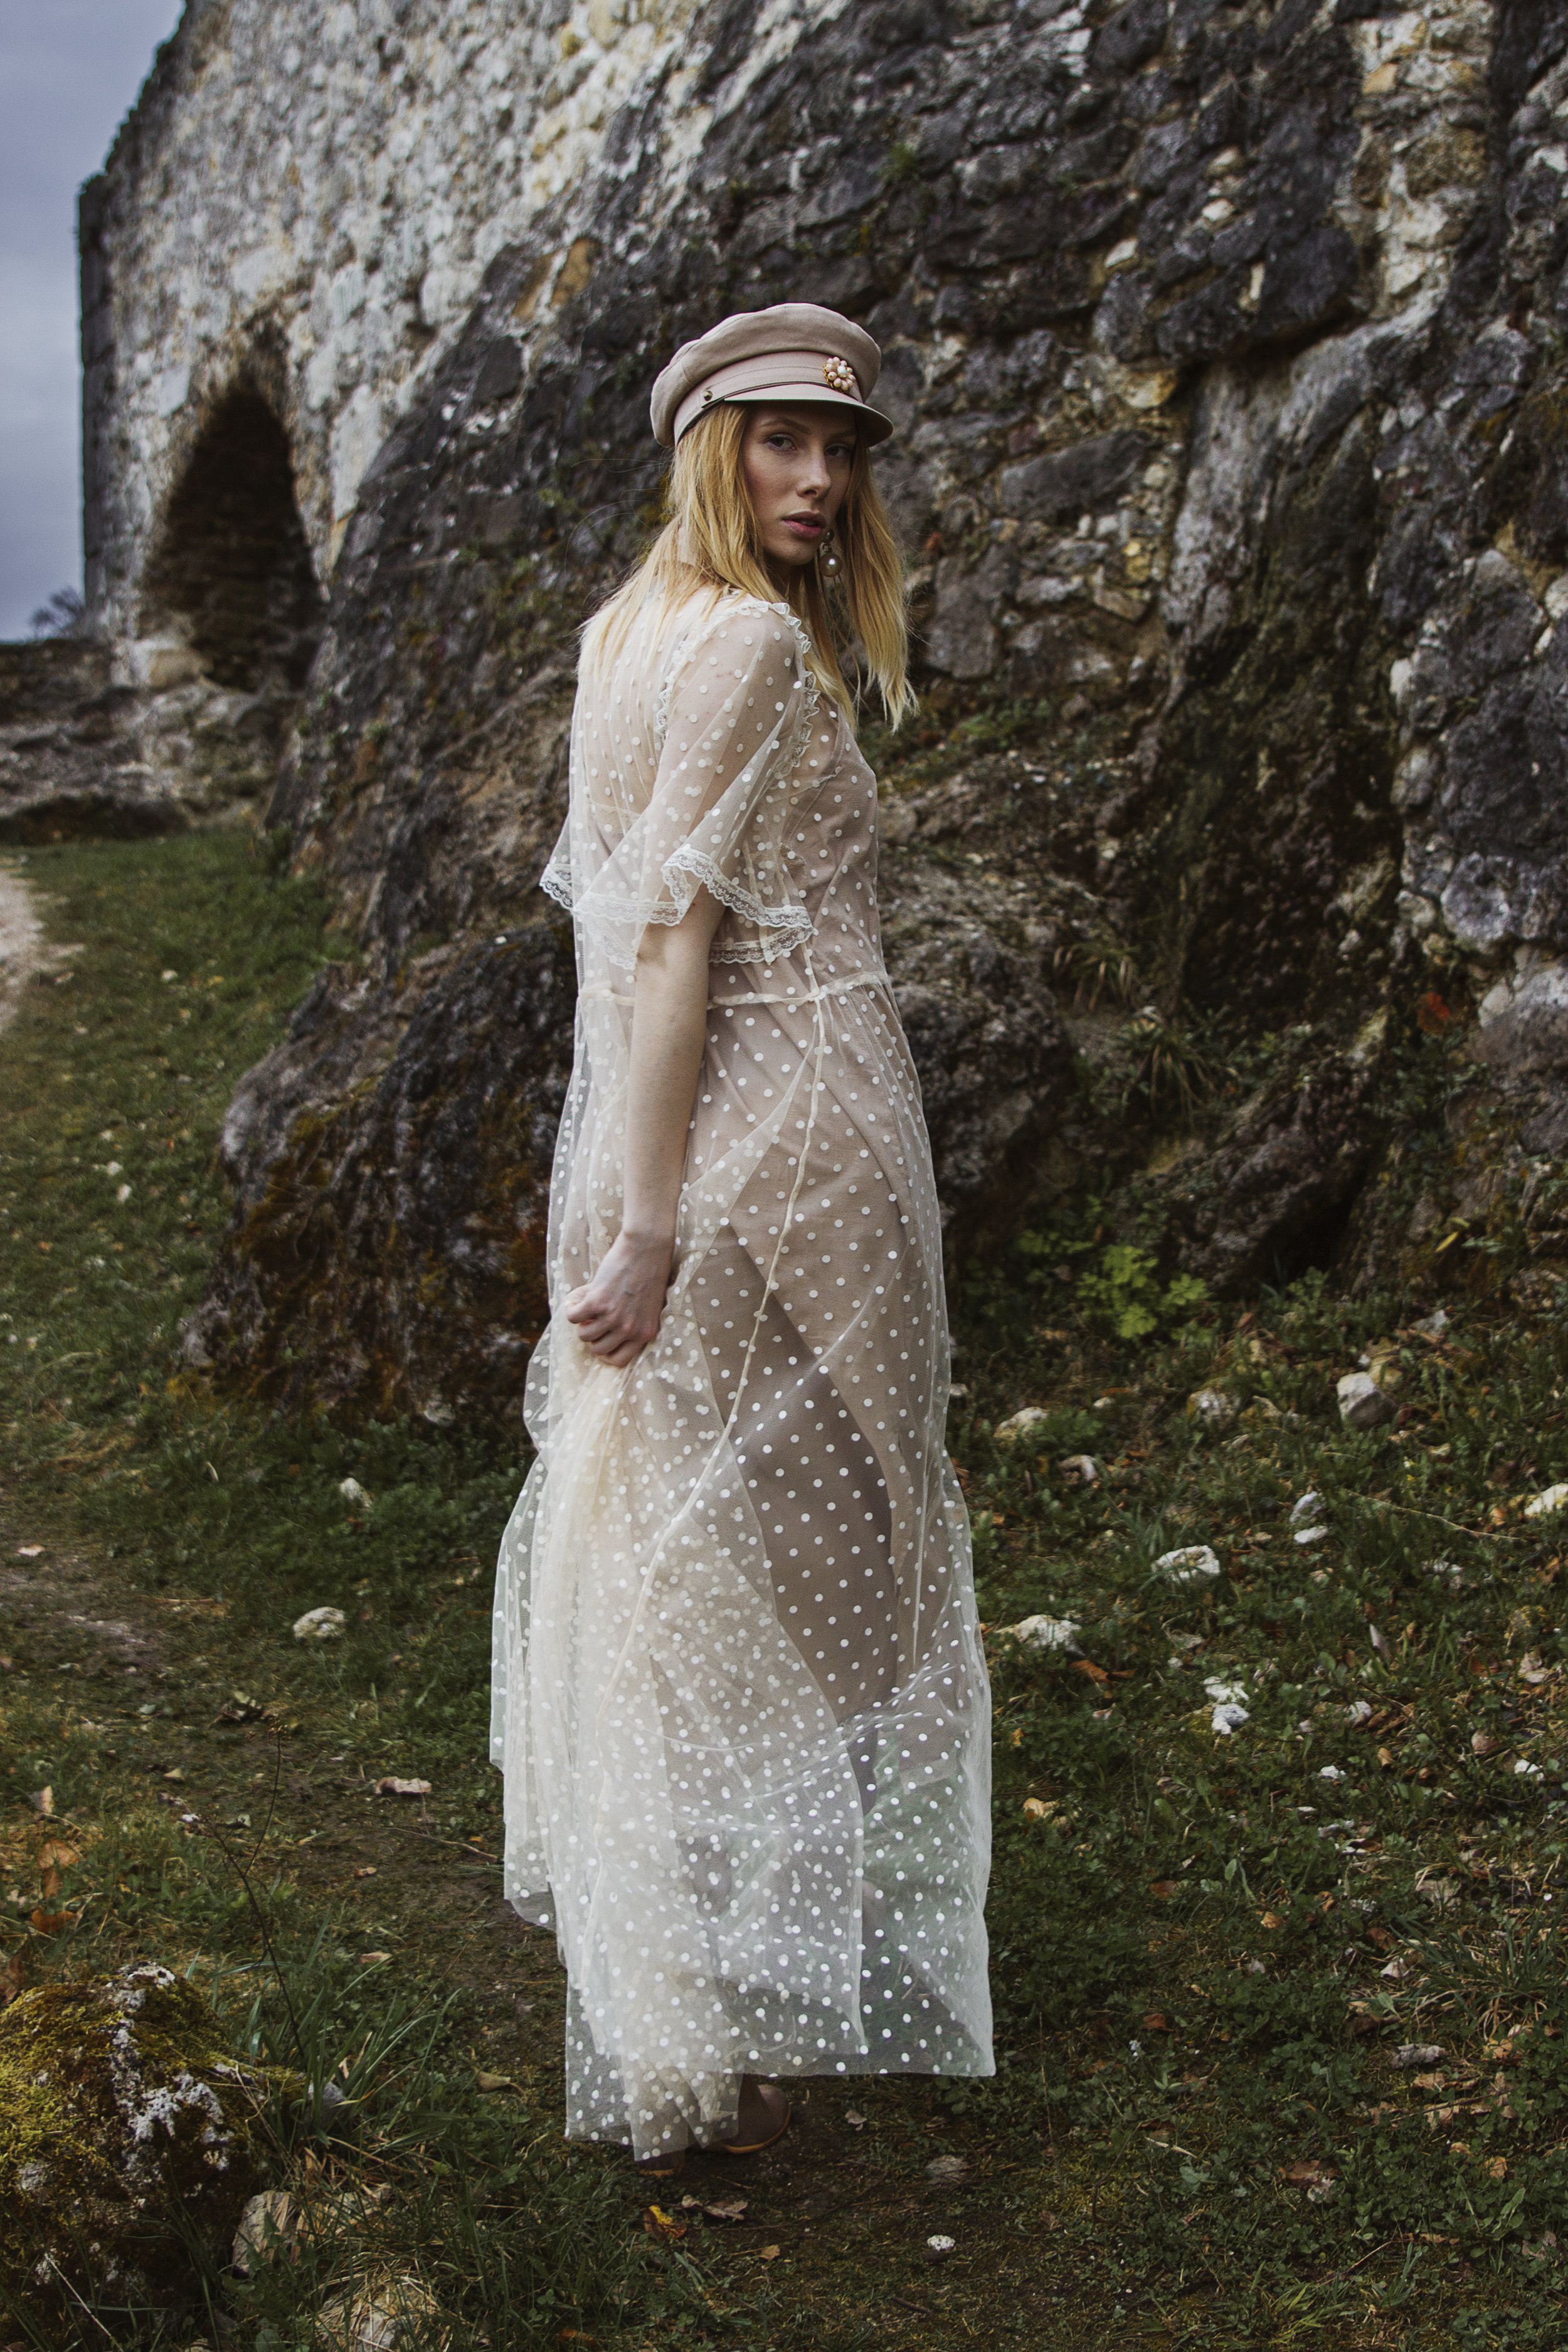 expensive-reality-luka-lajic-photo-fashion-sever (13).jpg